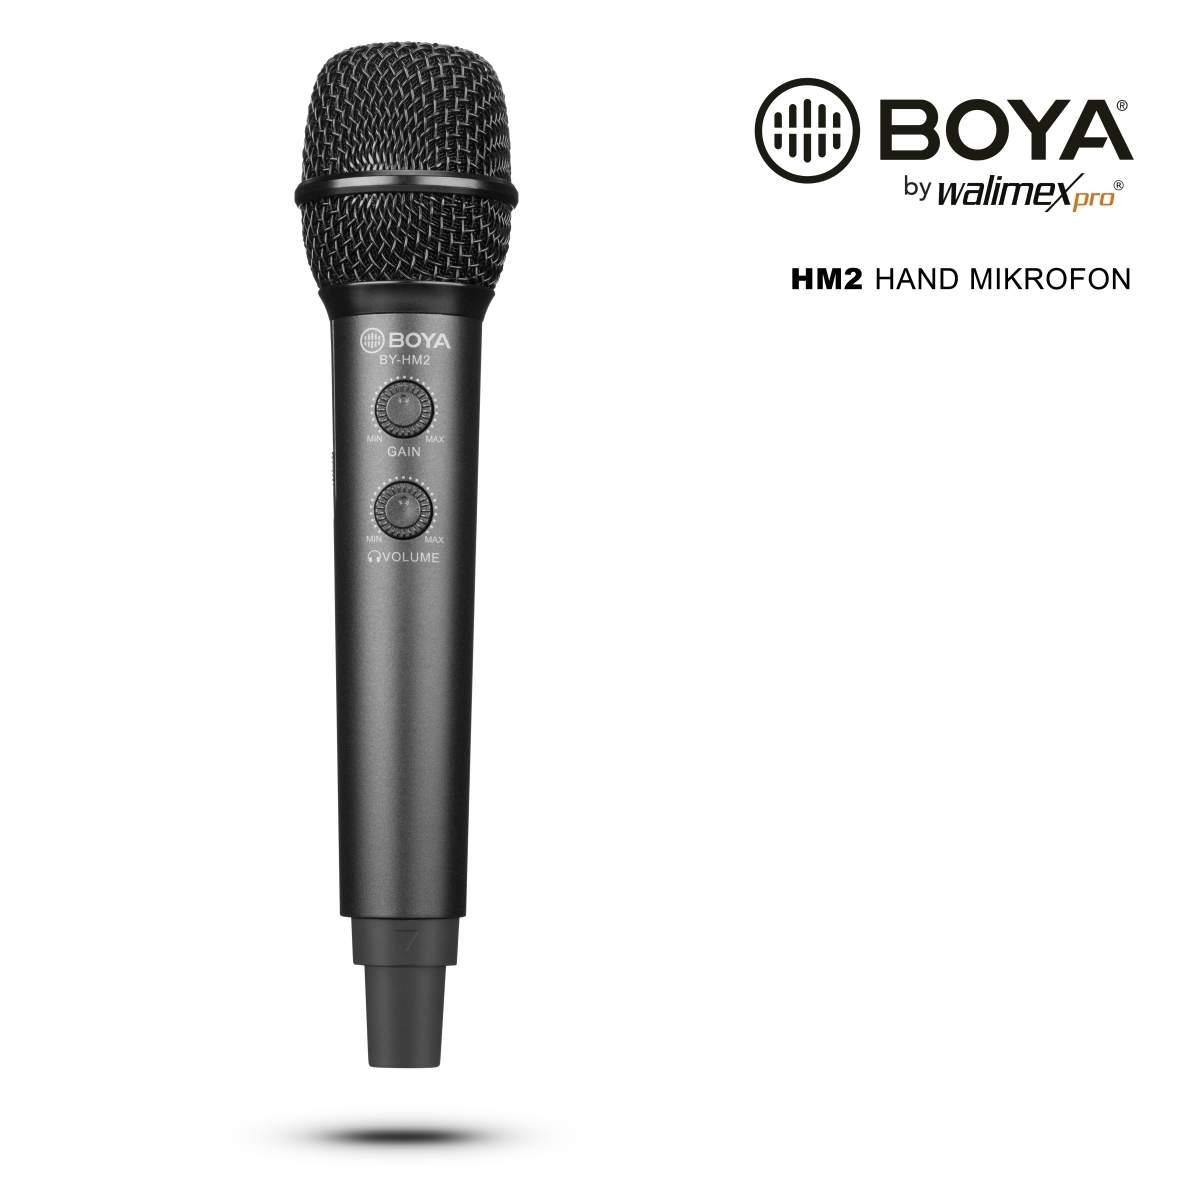 Walimex pro Boya HM2 Handheld Microphone